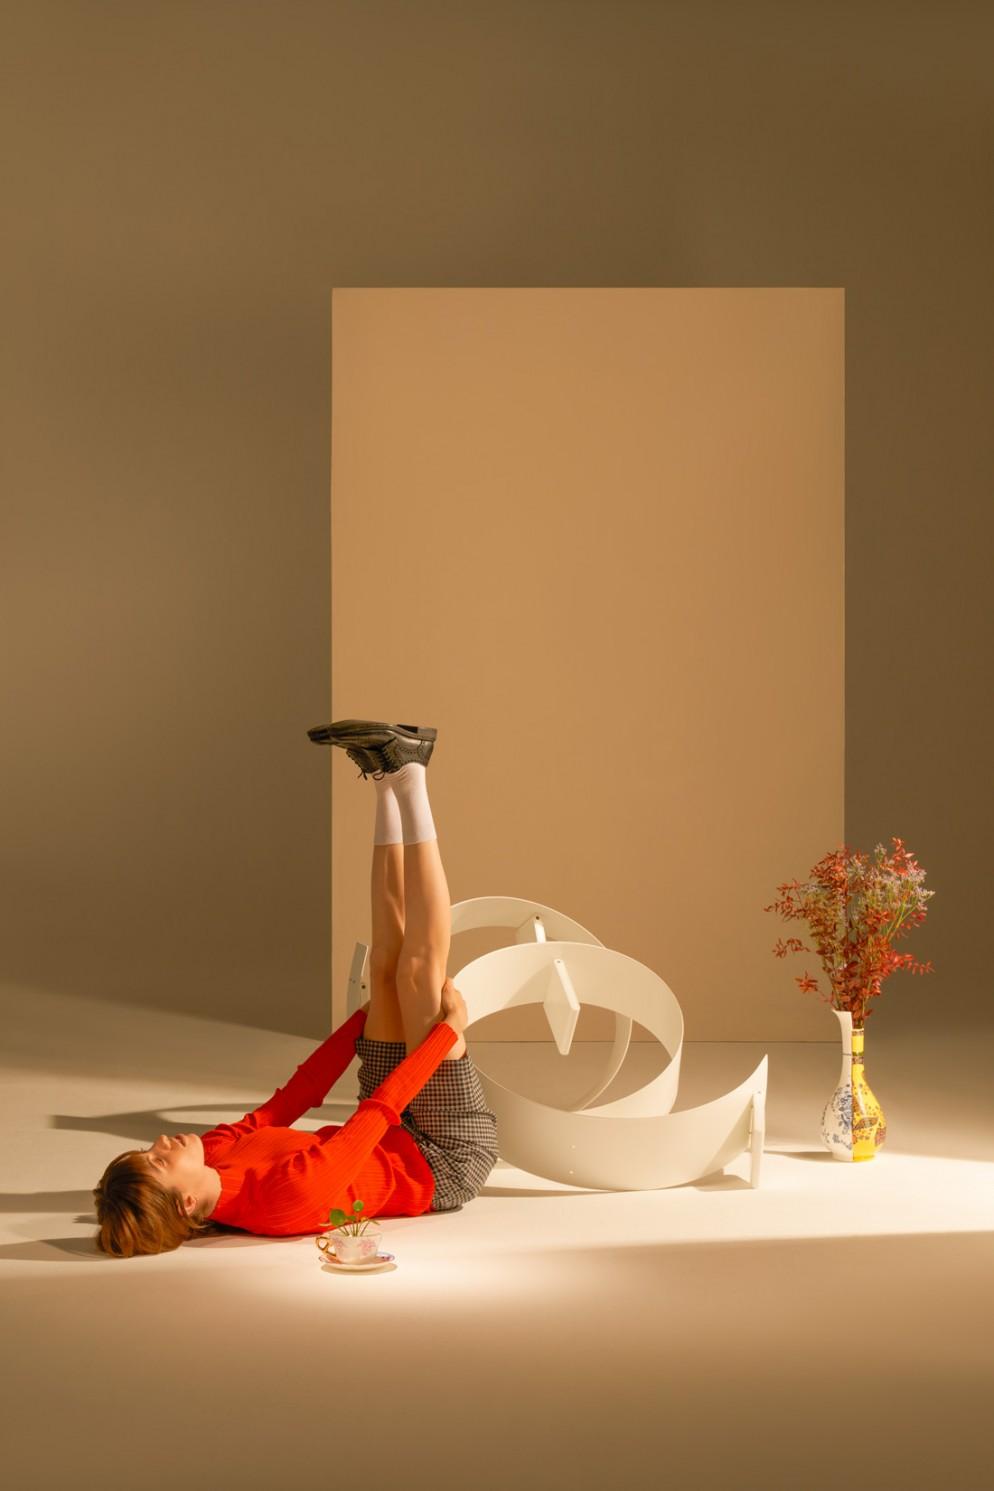 idee-per-arredare-yoox-living-corriere-07